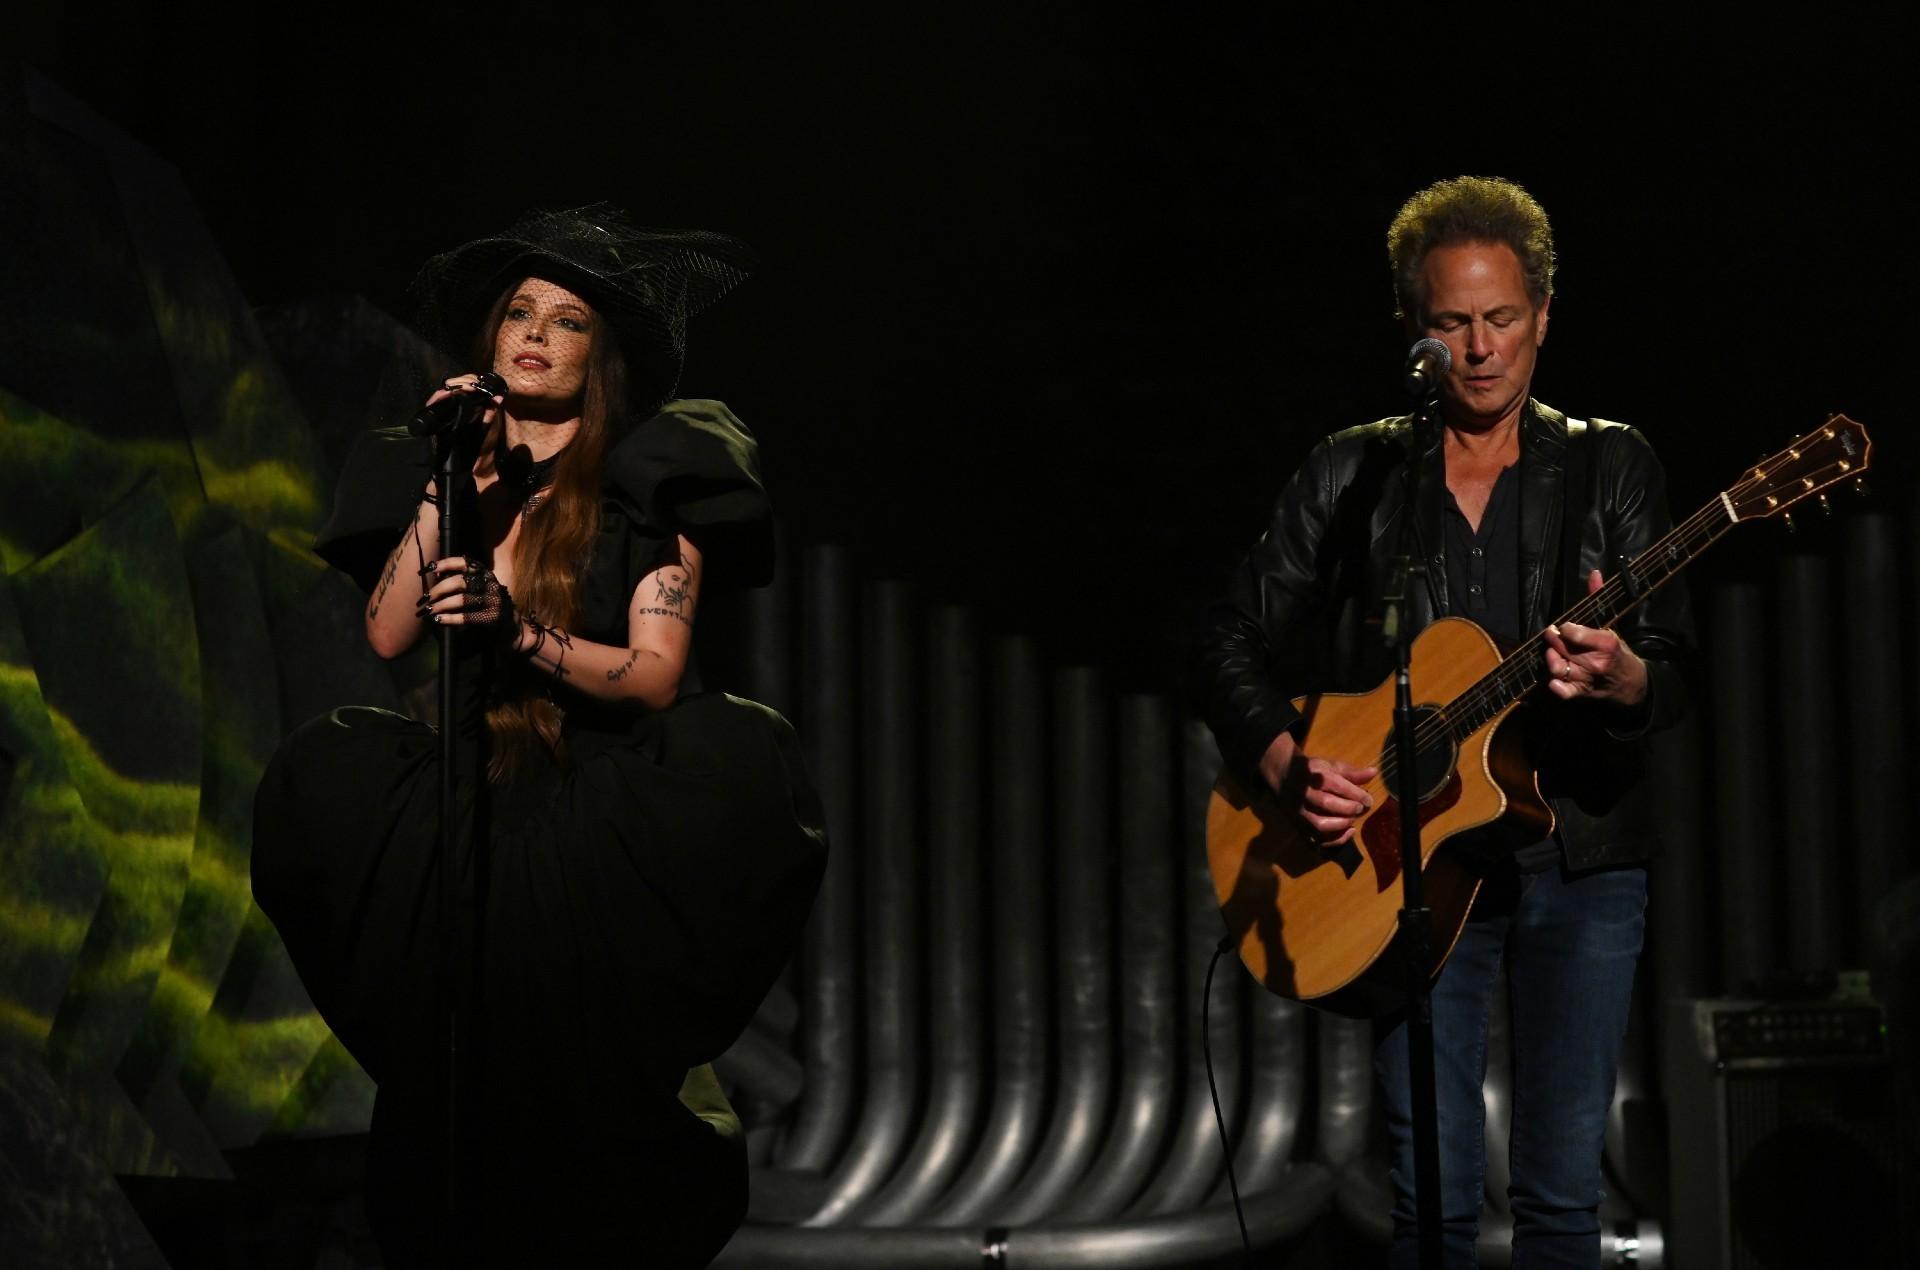 Halsey & Lindsey Buckingham Deliver Stunning Performance of 'Darling' on 'SNL': Watch